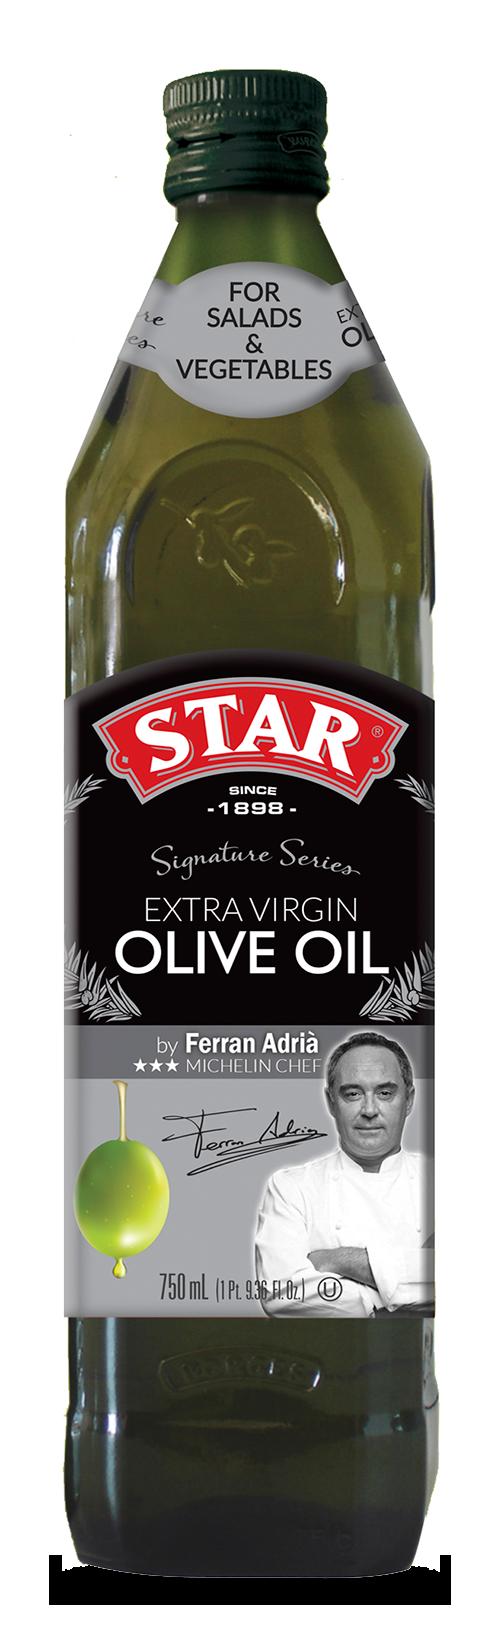 Signature Series Olive Oils by Ferran Adrià – Star Fine Foods